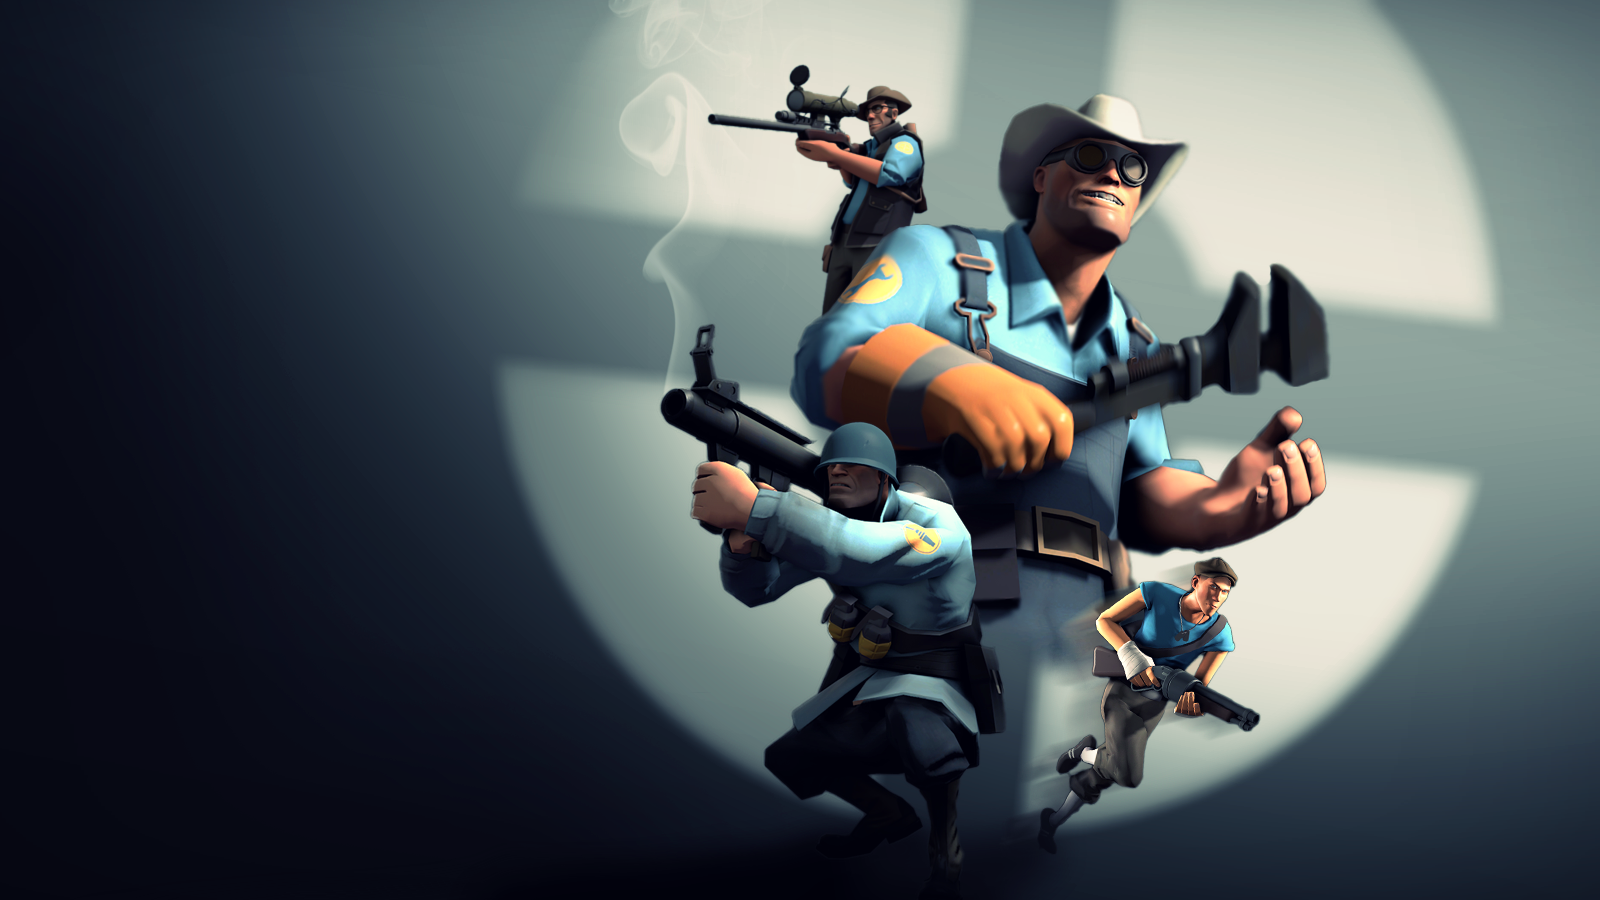 ... Team Fortress 2 Wallpaper (BLU) by Robogineer